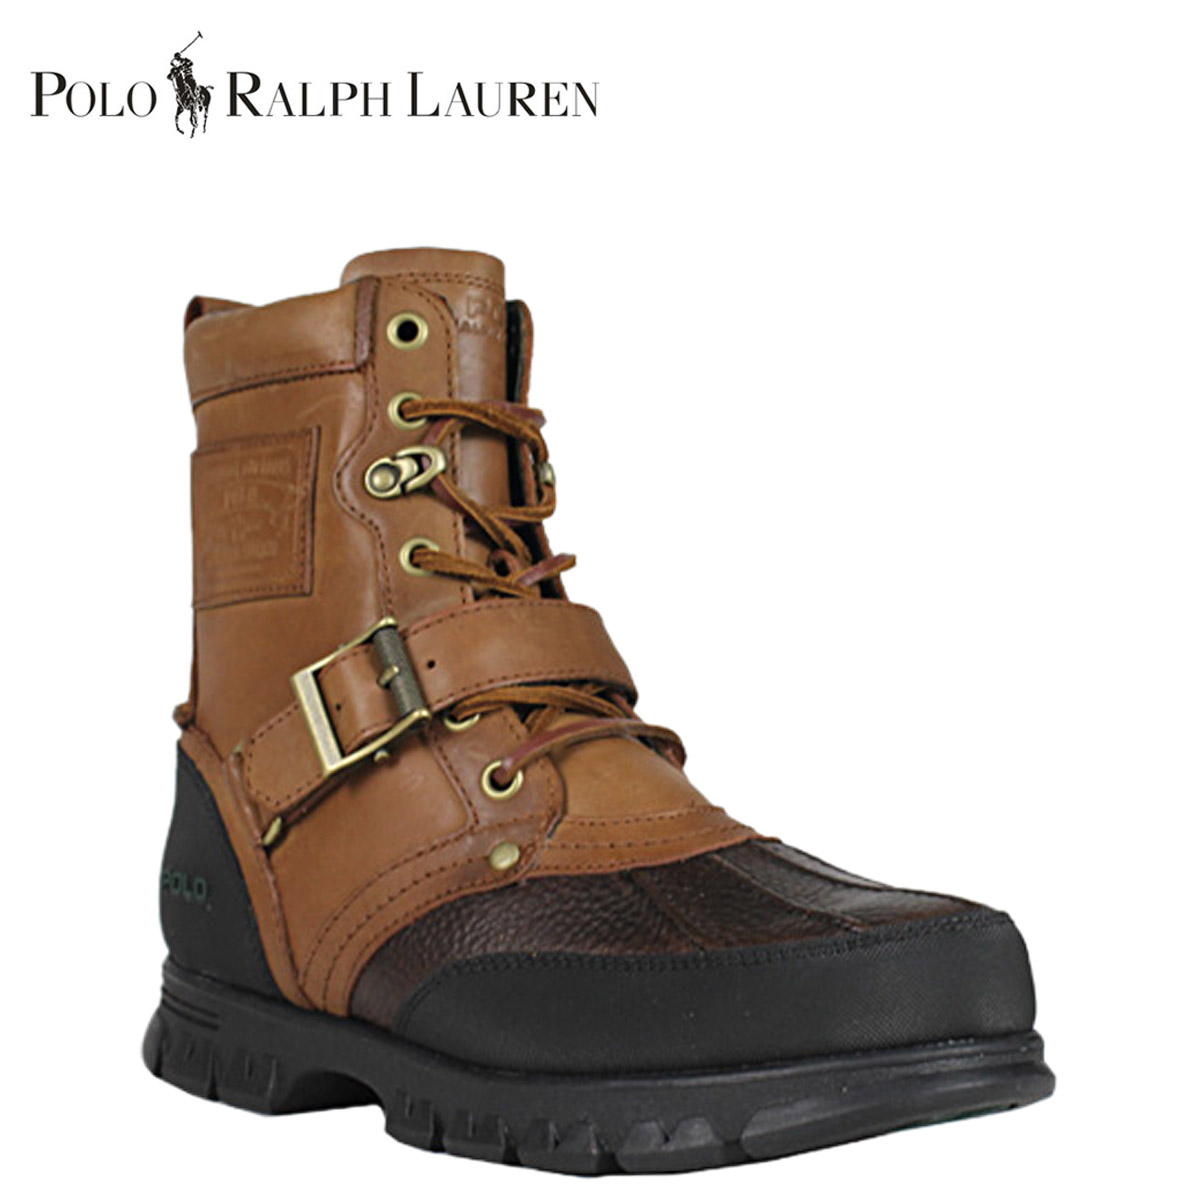 Leather Ralph Tongue Polo Men Lauren 81213959714j Boots Wood Tenard Briar j54RLA